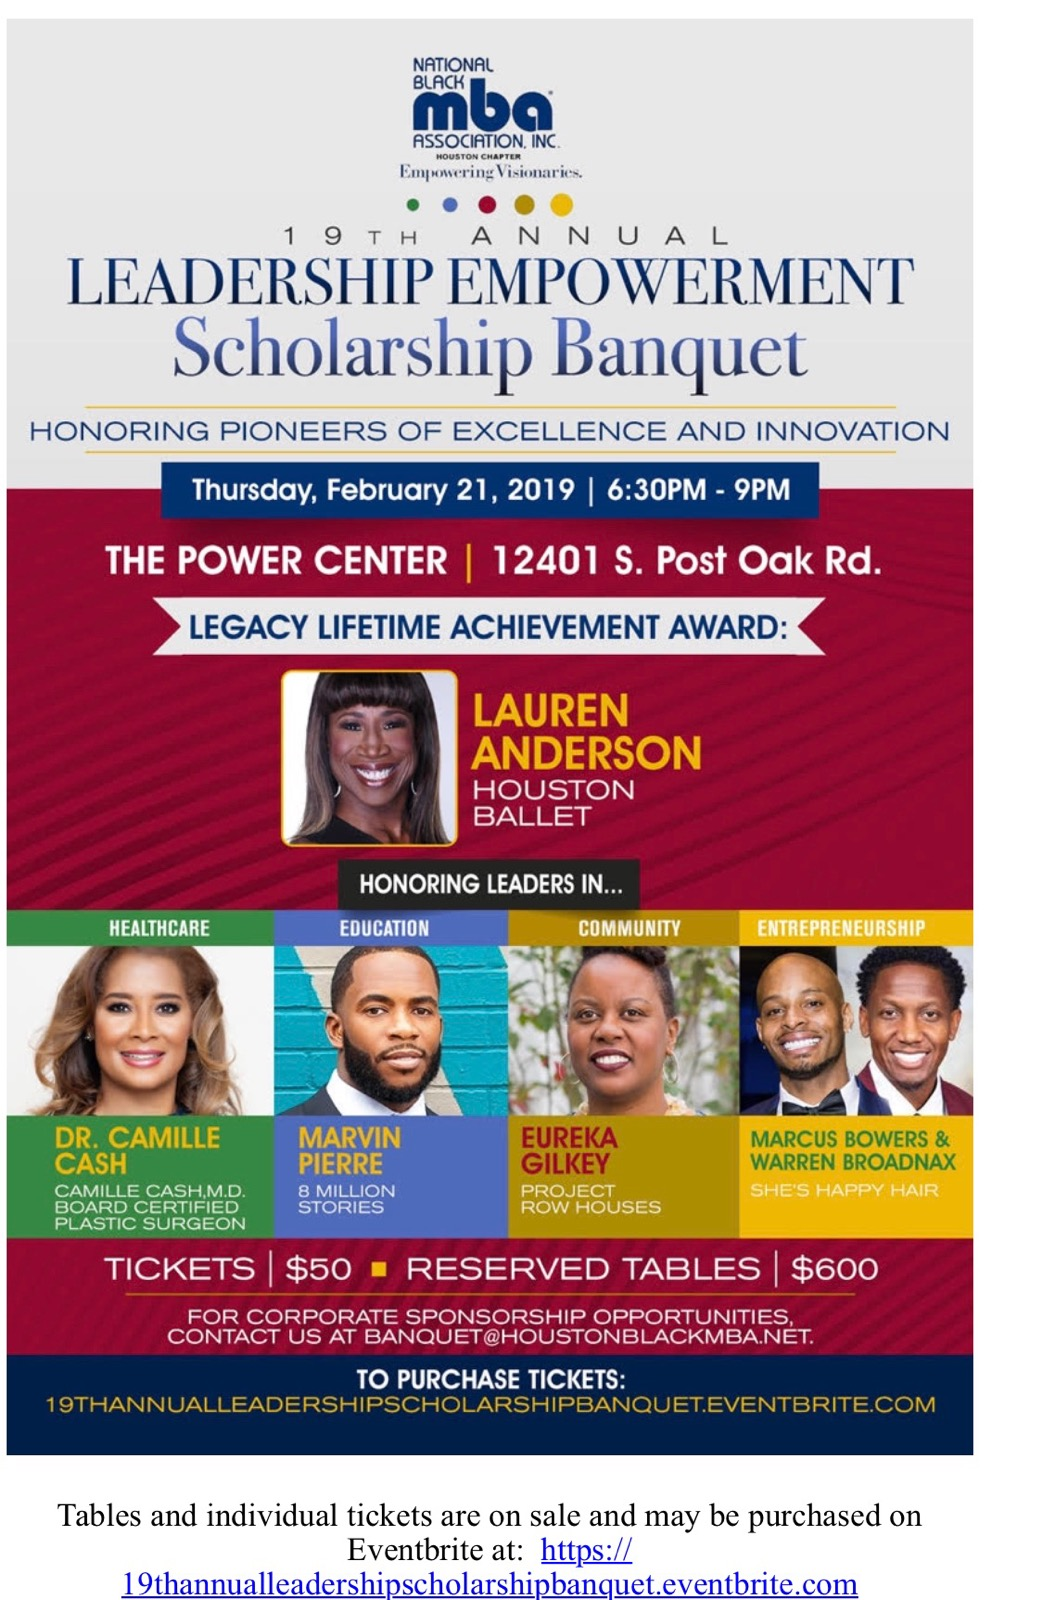 2019 Scholarship Banquet